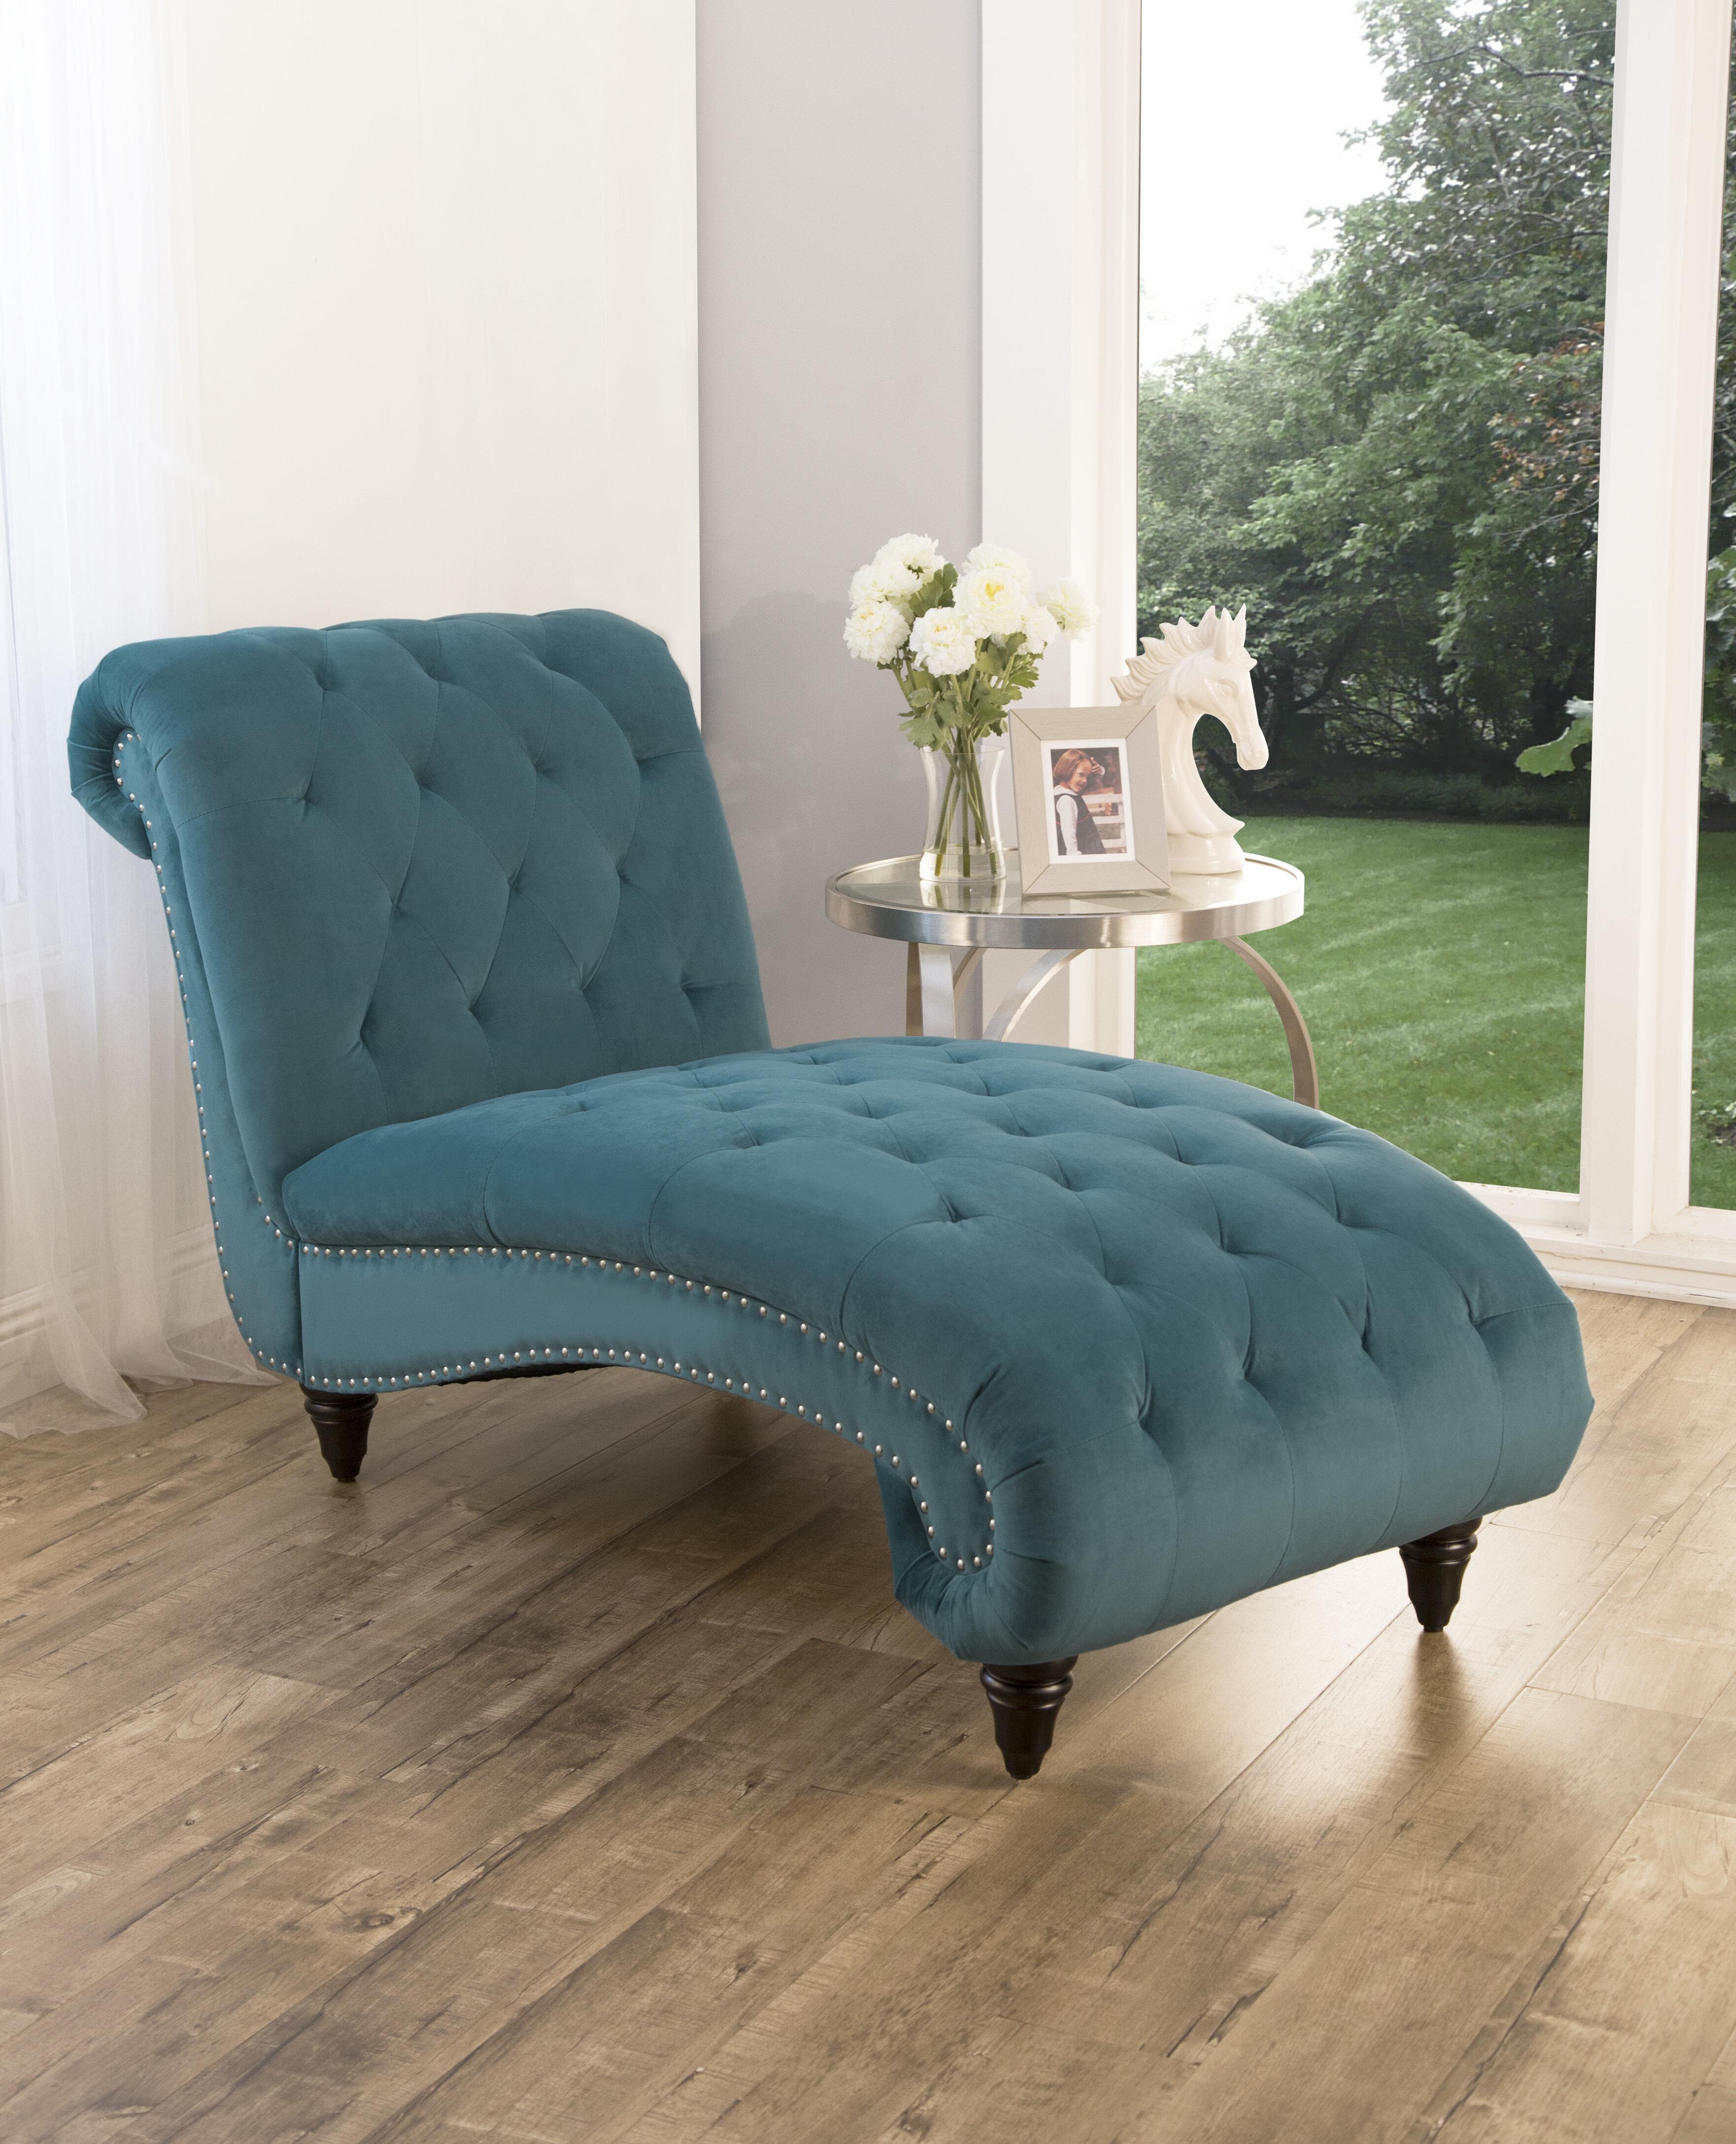 - House Of Hampton Atkin Tufted Velvet Chaise Lounge & Reviews Wayfair